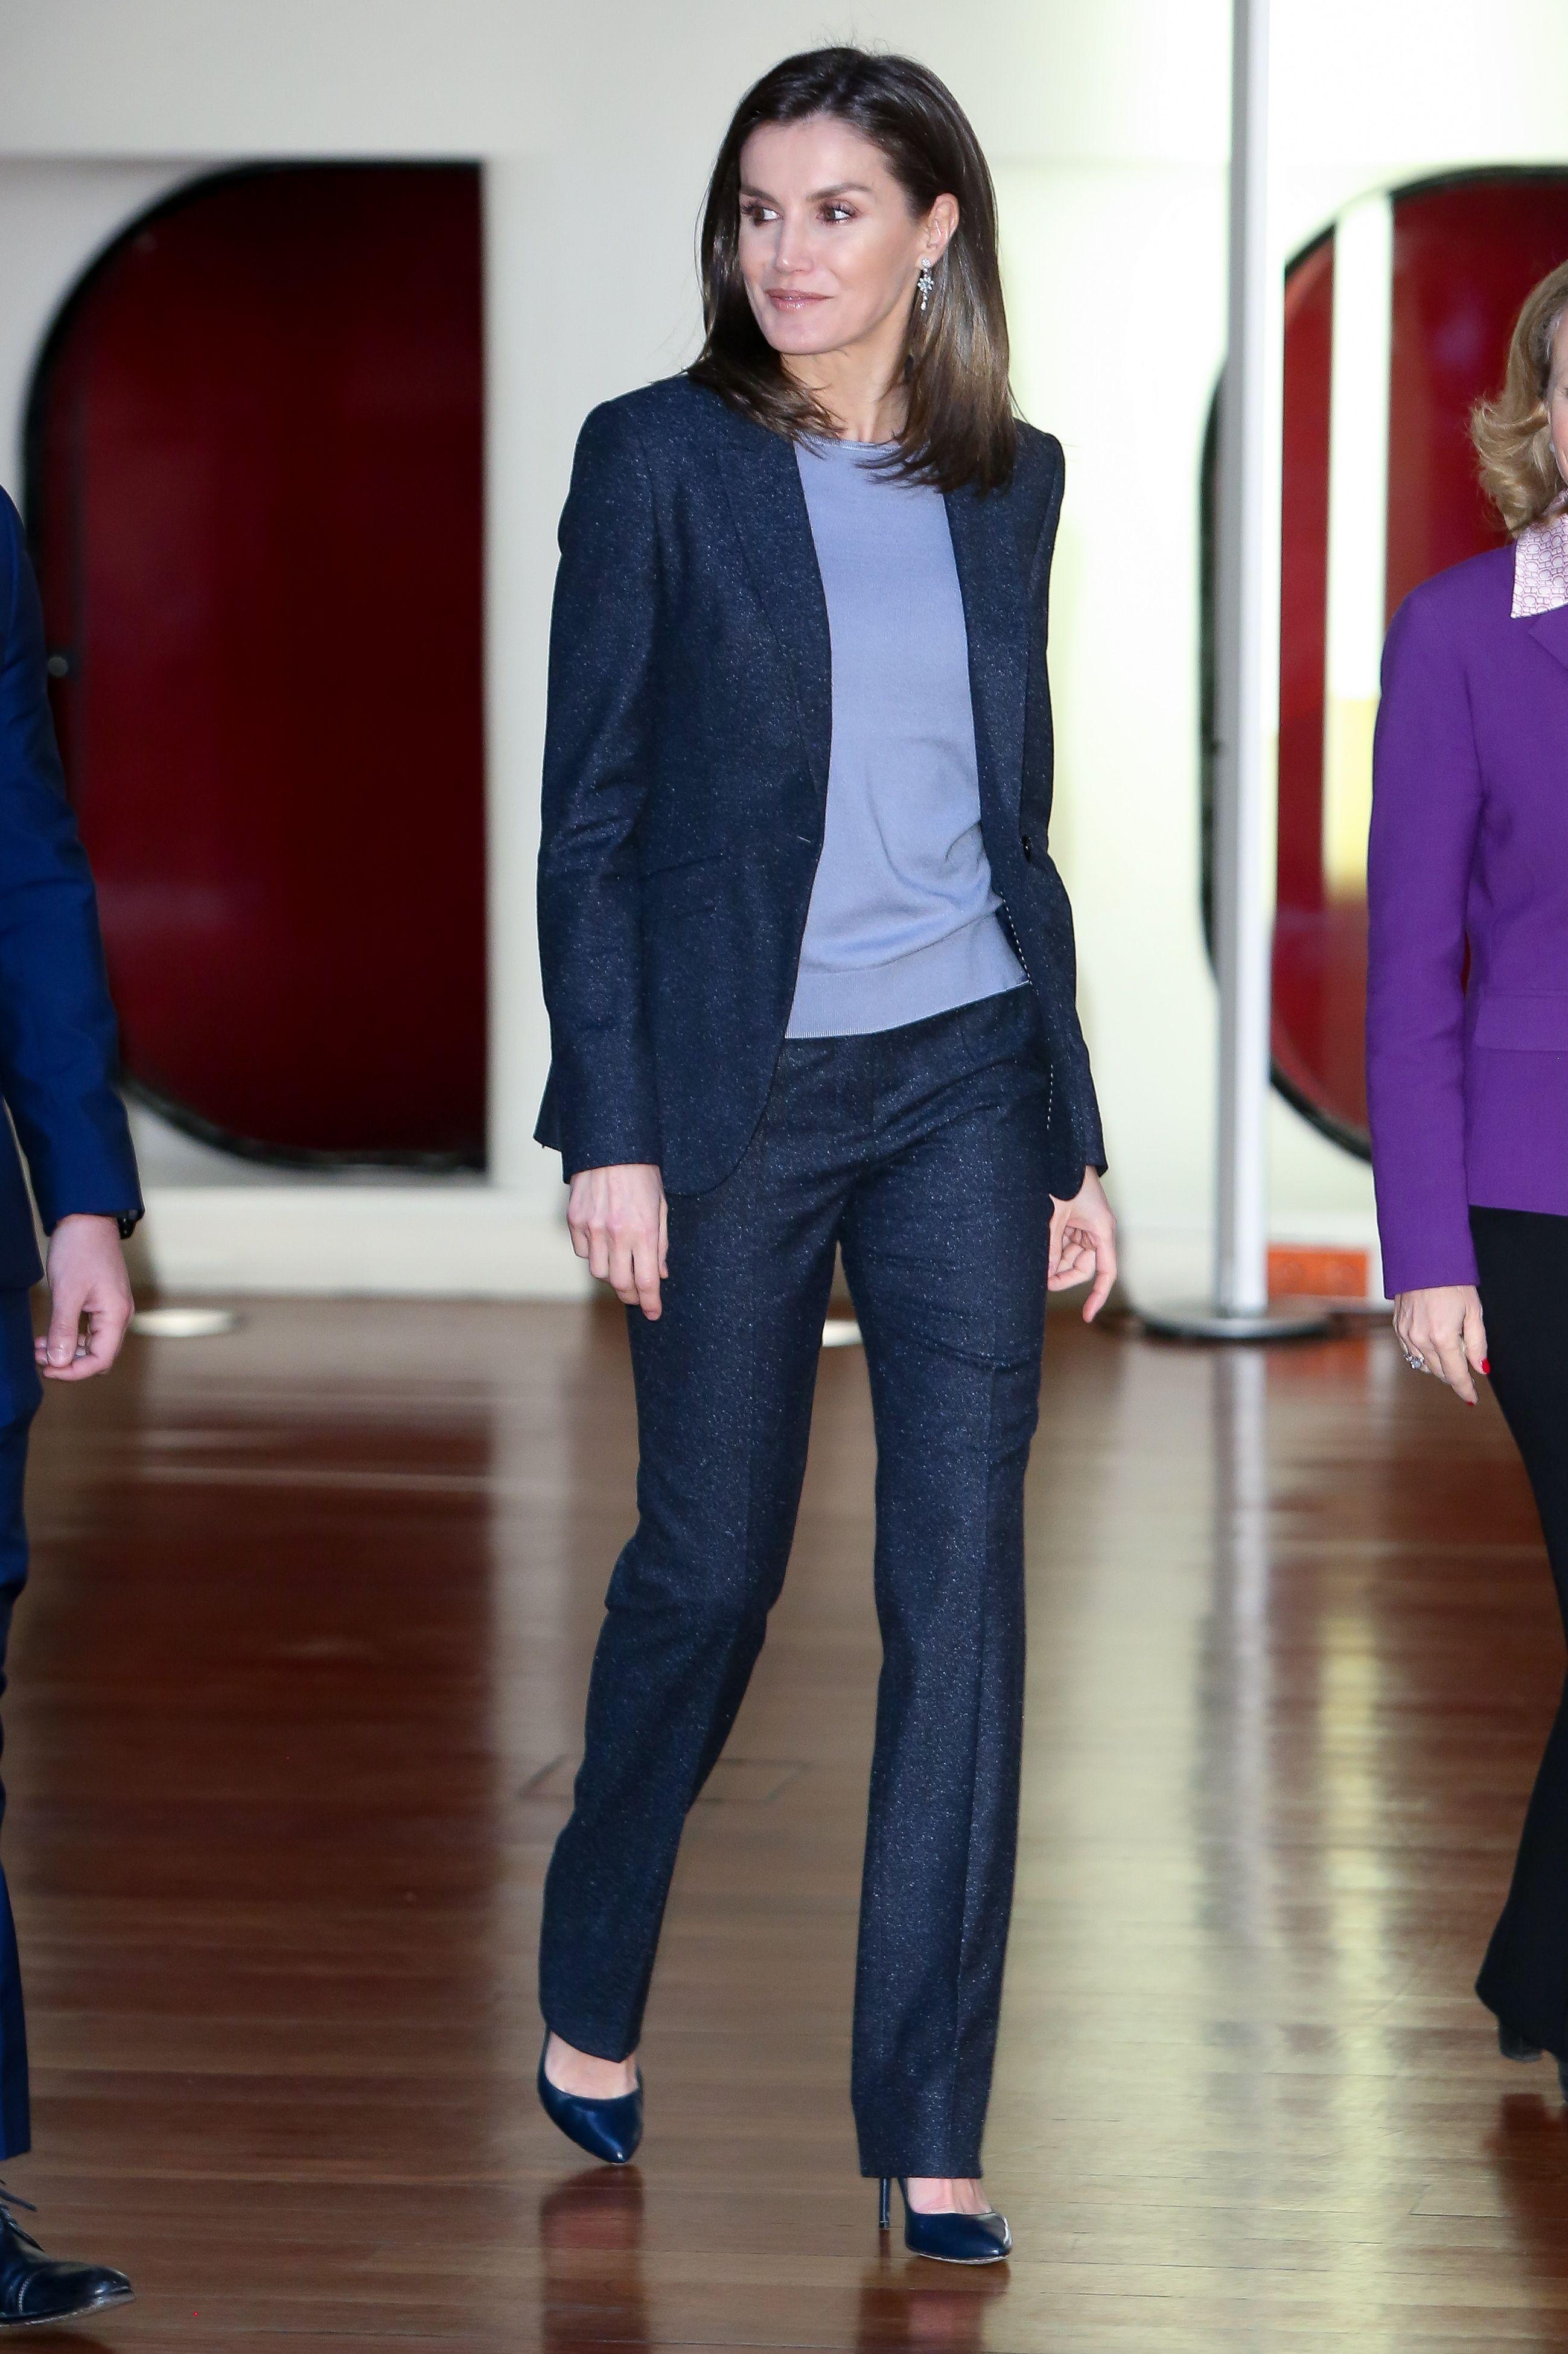 El estilo de la Reina Letizia - Todos los  looks  de la reina Letizia 29b8372b42a